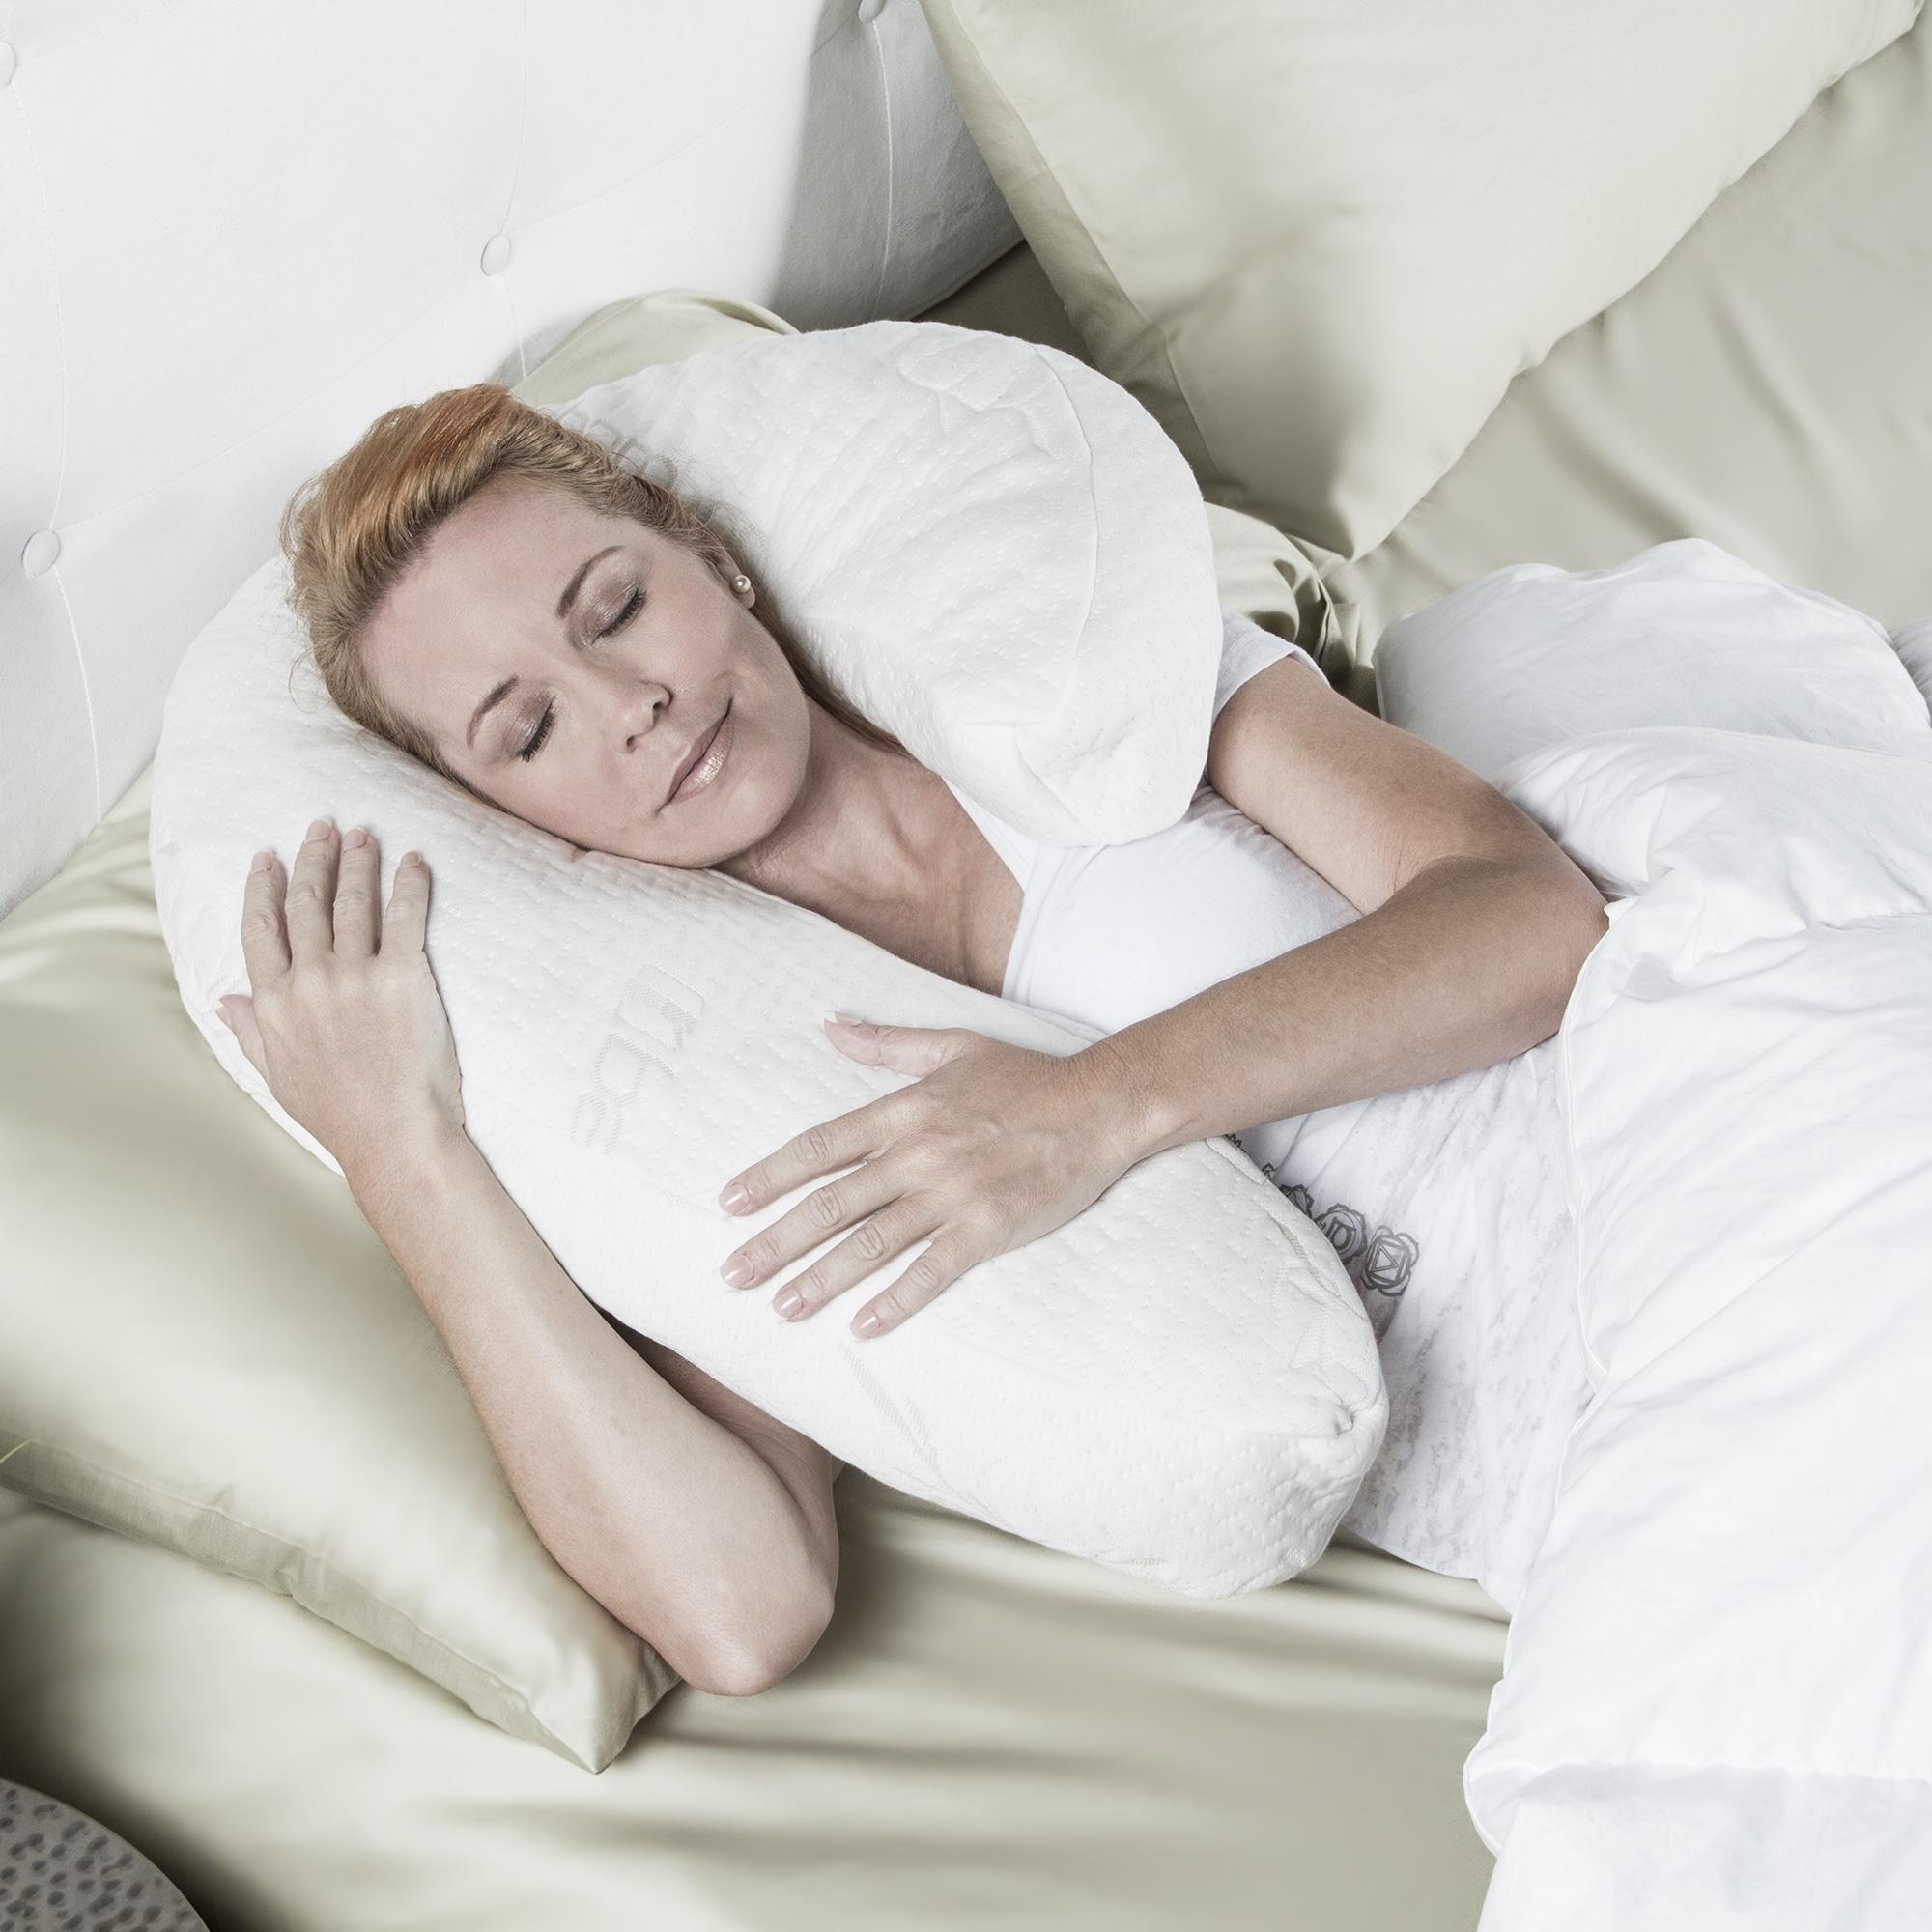 Shop Avana Uno Side Sleeper Memory Foam Pillow With Rayon From